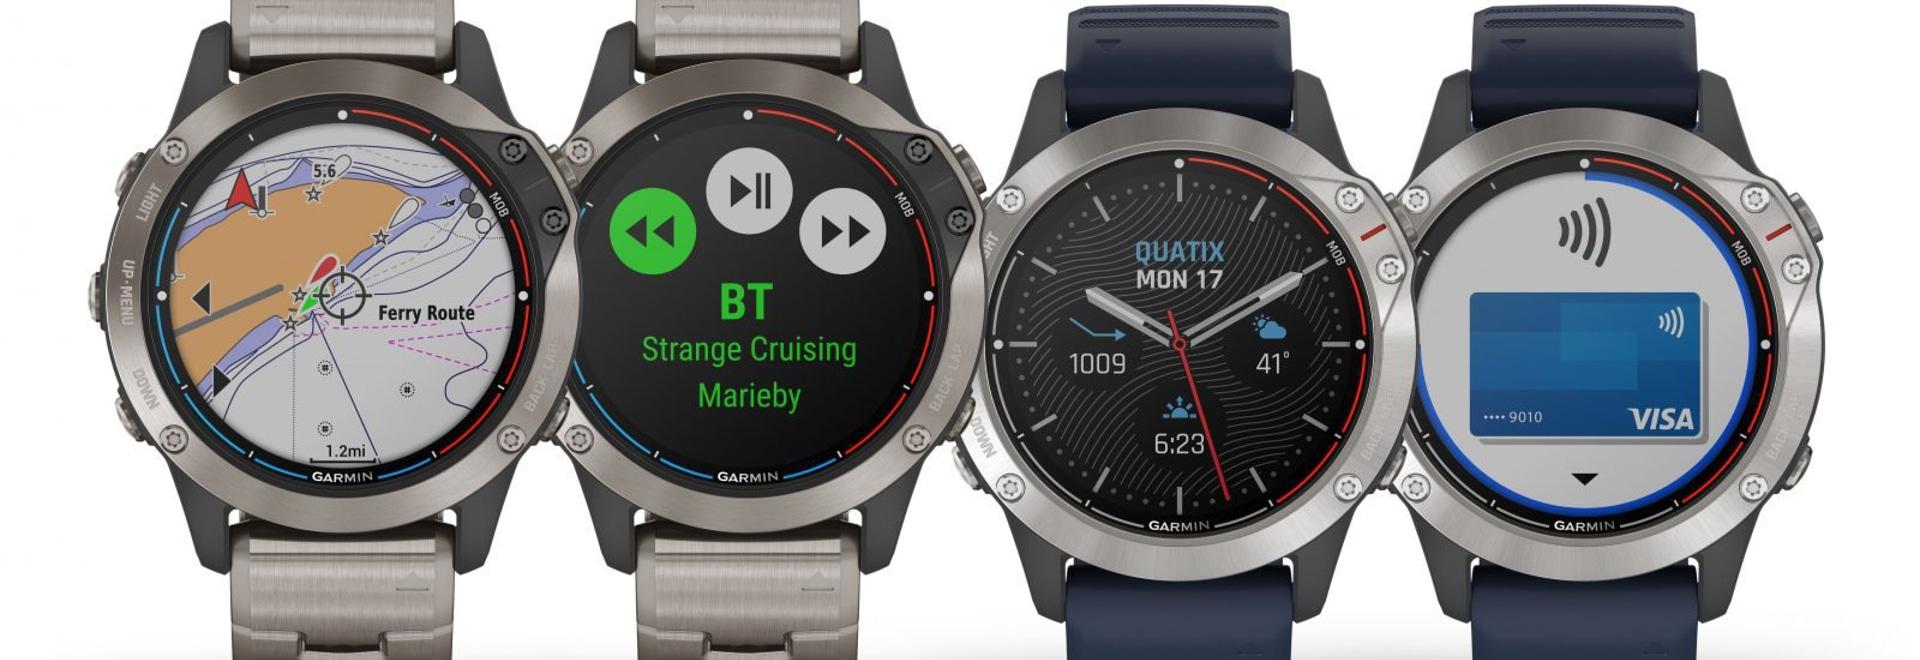 Garmin adds solar charging to its marine series smartwatch